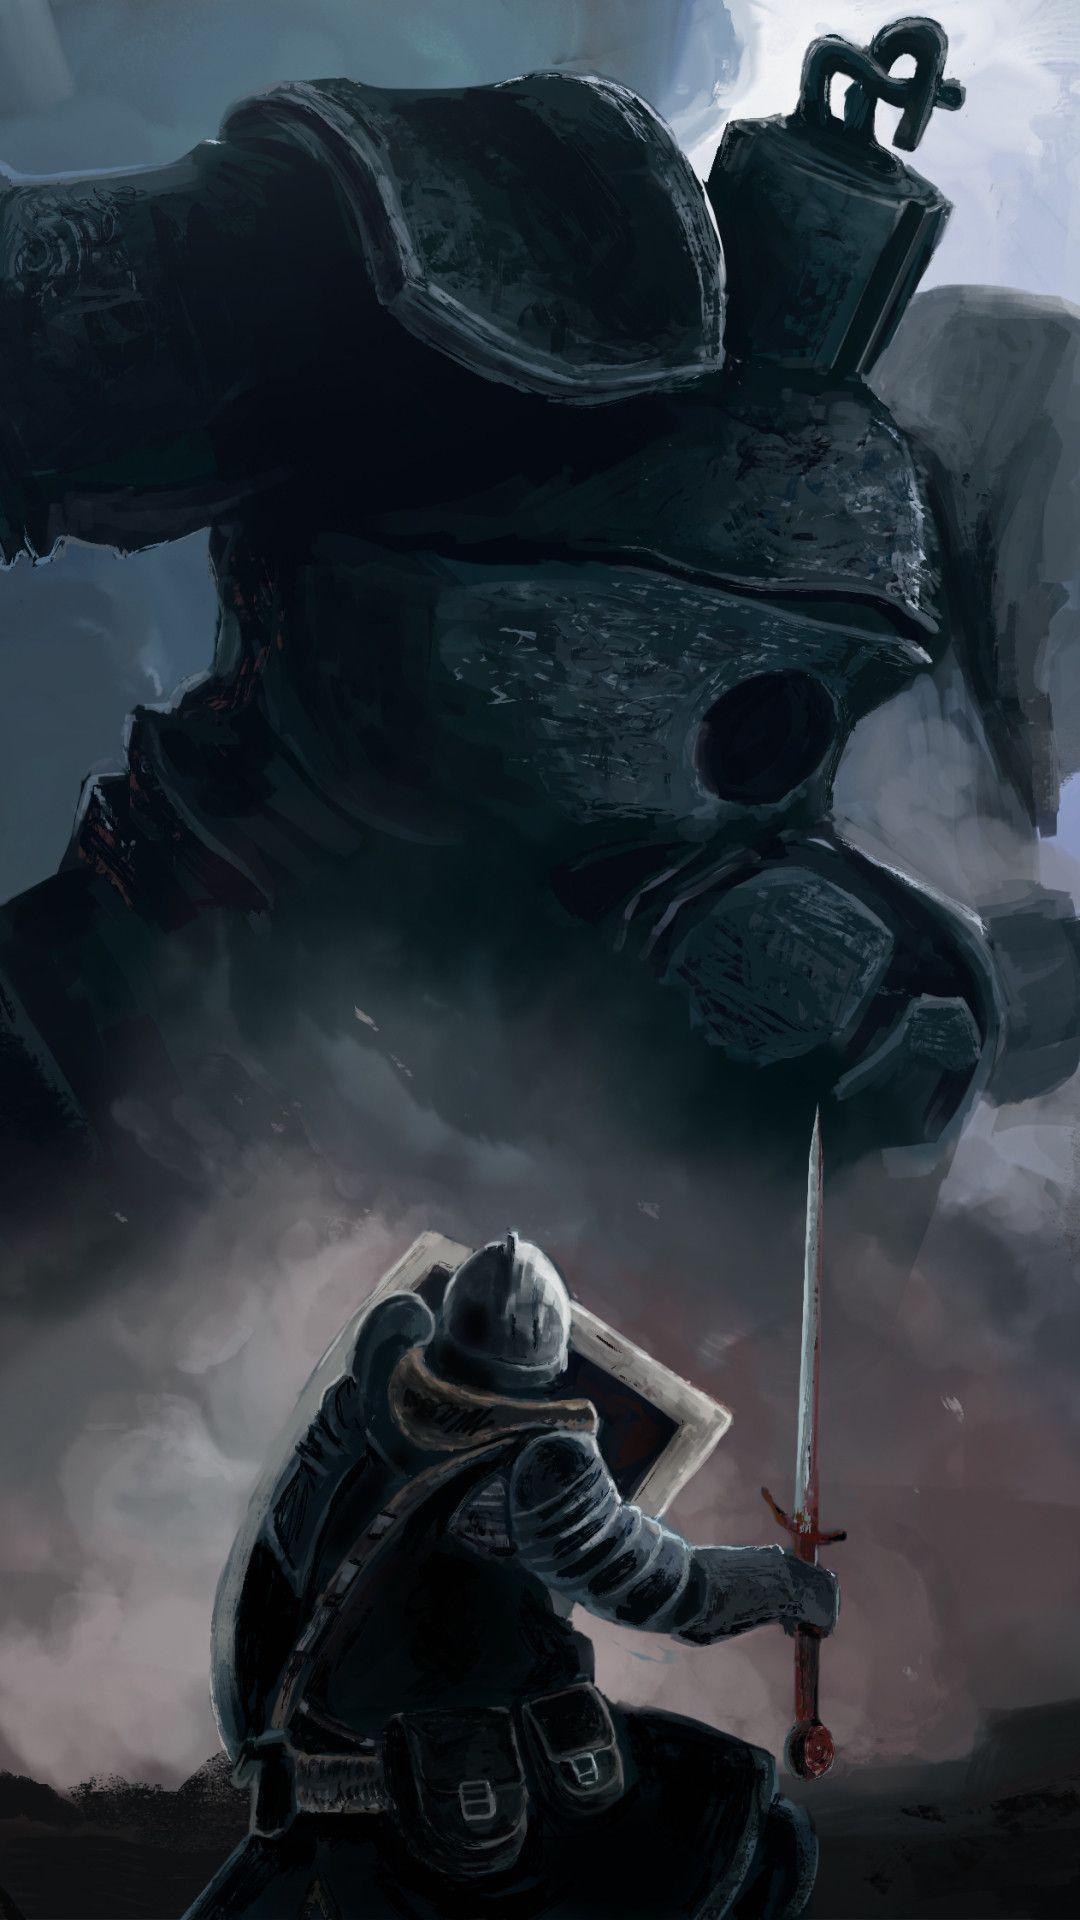 Dark Souls Abyss Watchers Wallpaper Download In 2020 Dark Souls New Wallpaper Hd Dark